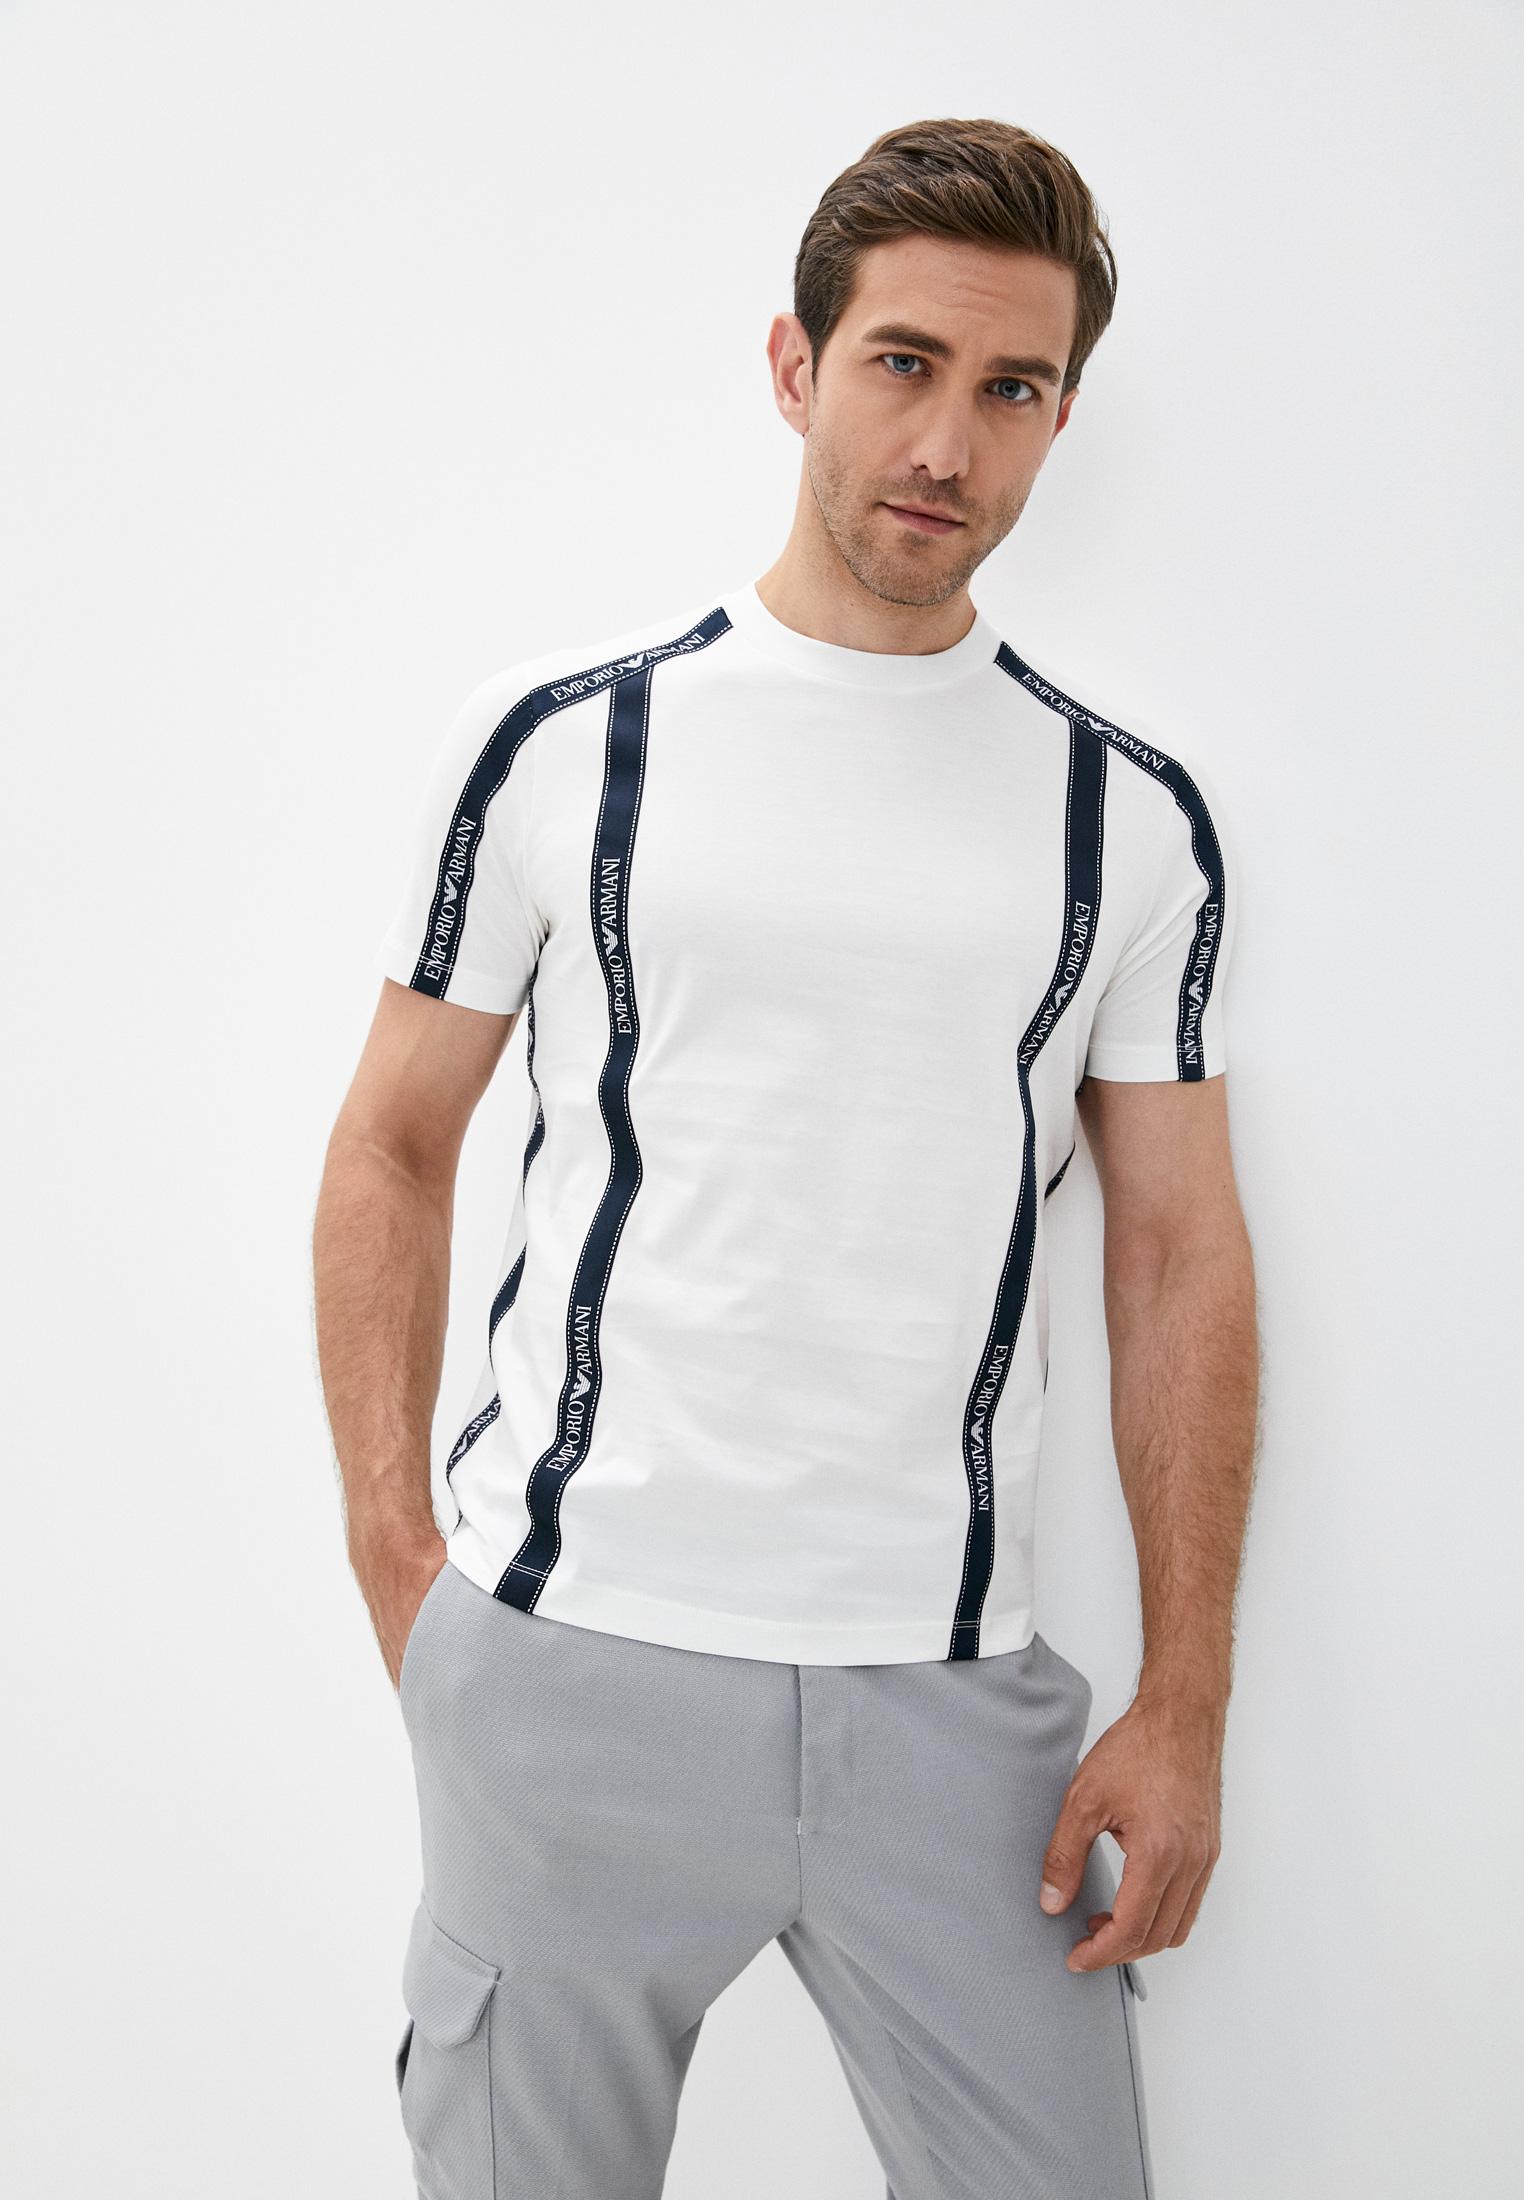 Мужская футболка Emporio Armani (Эмпорио Армани) 6h1tg4 1jtuz